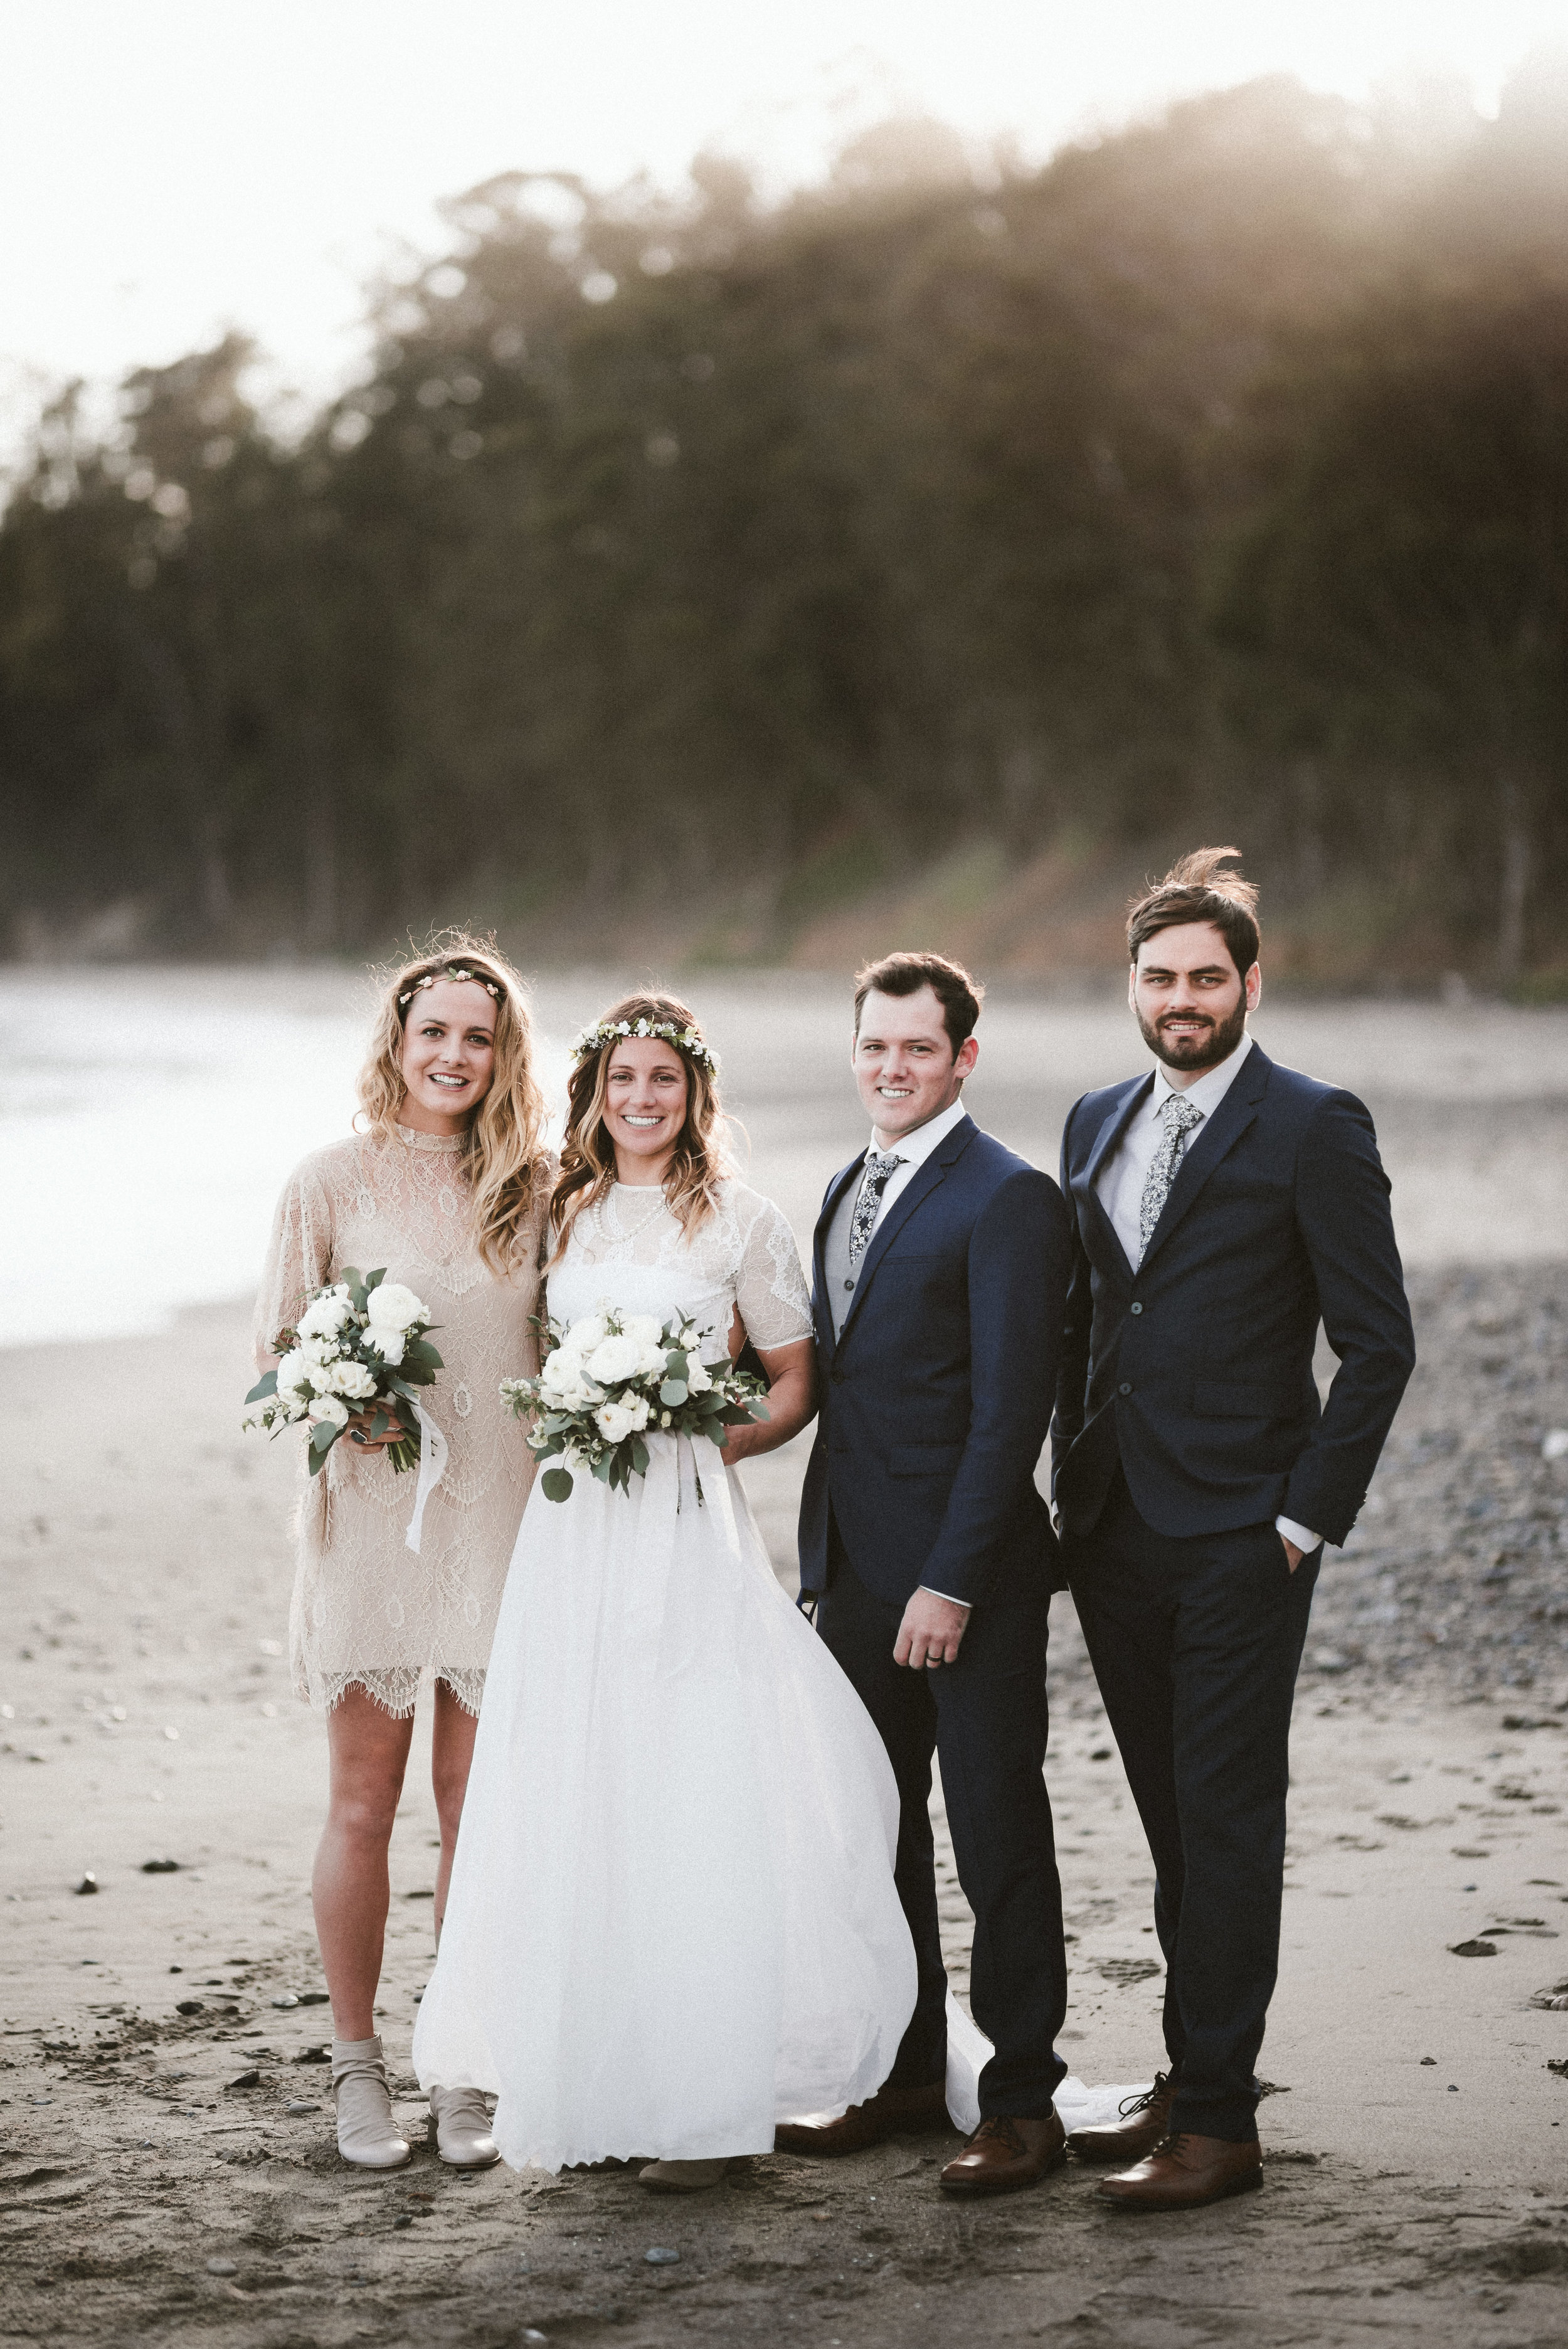 Wedding Party Tony-Gambino-Photography-1123.jpg